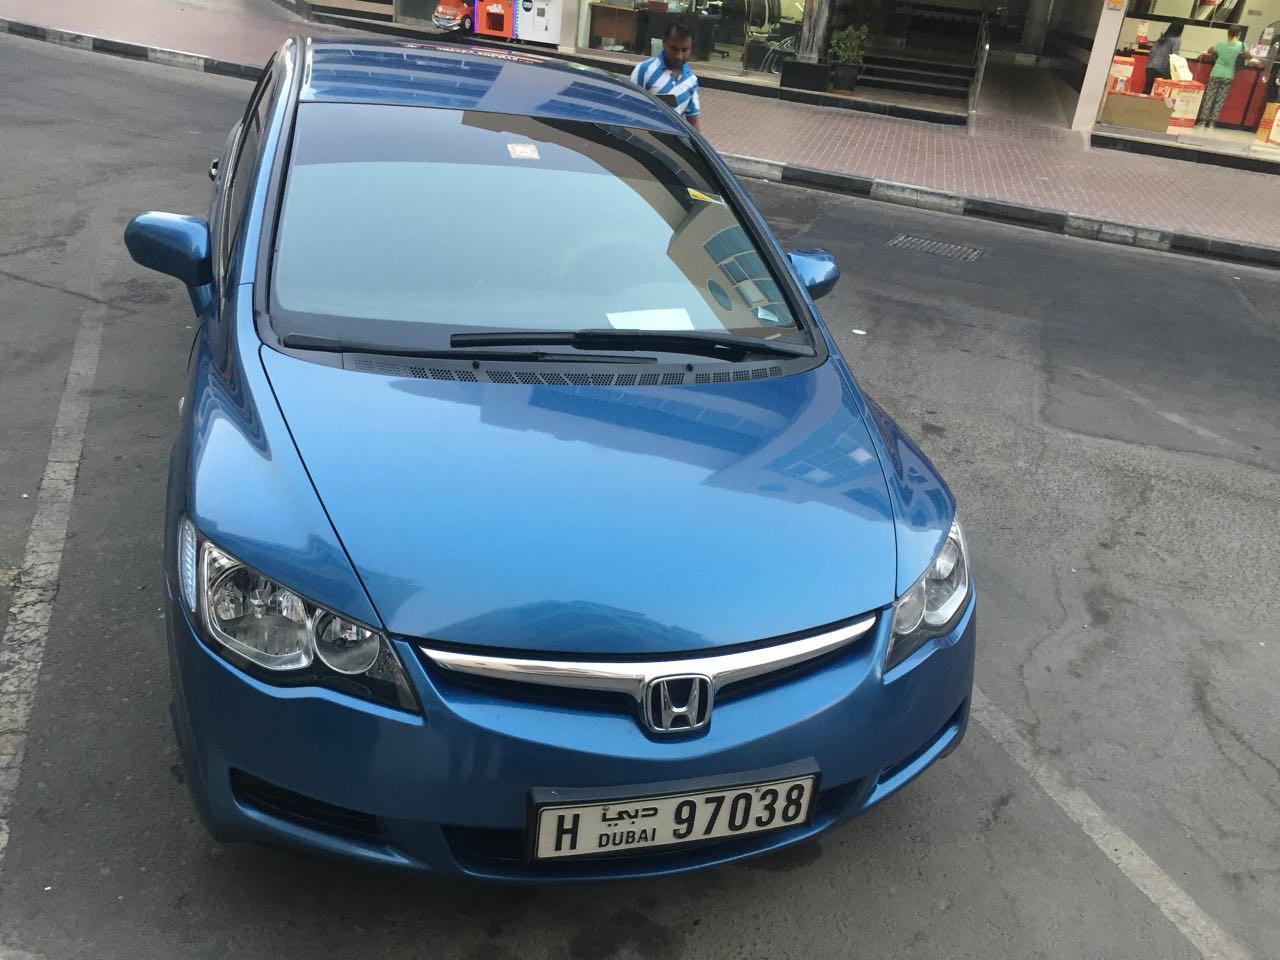 Used Honda Civic 2007 Car For Sale In Dubai 755799